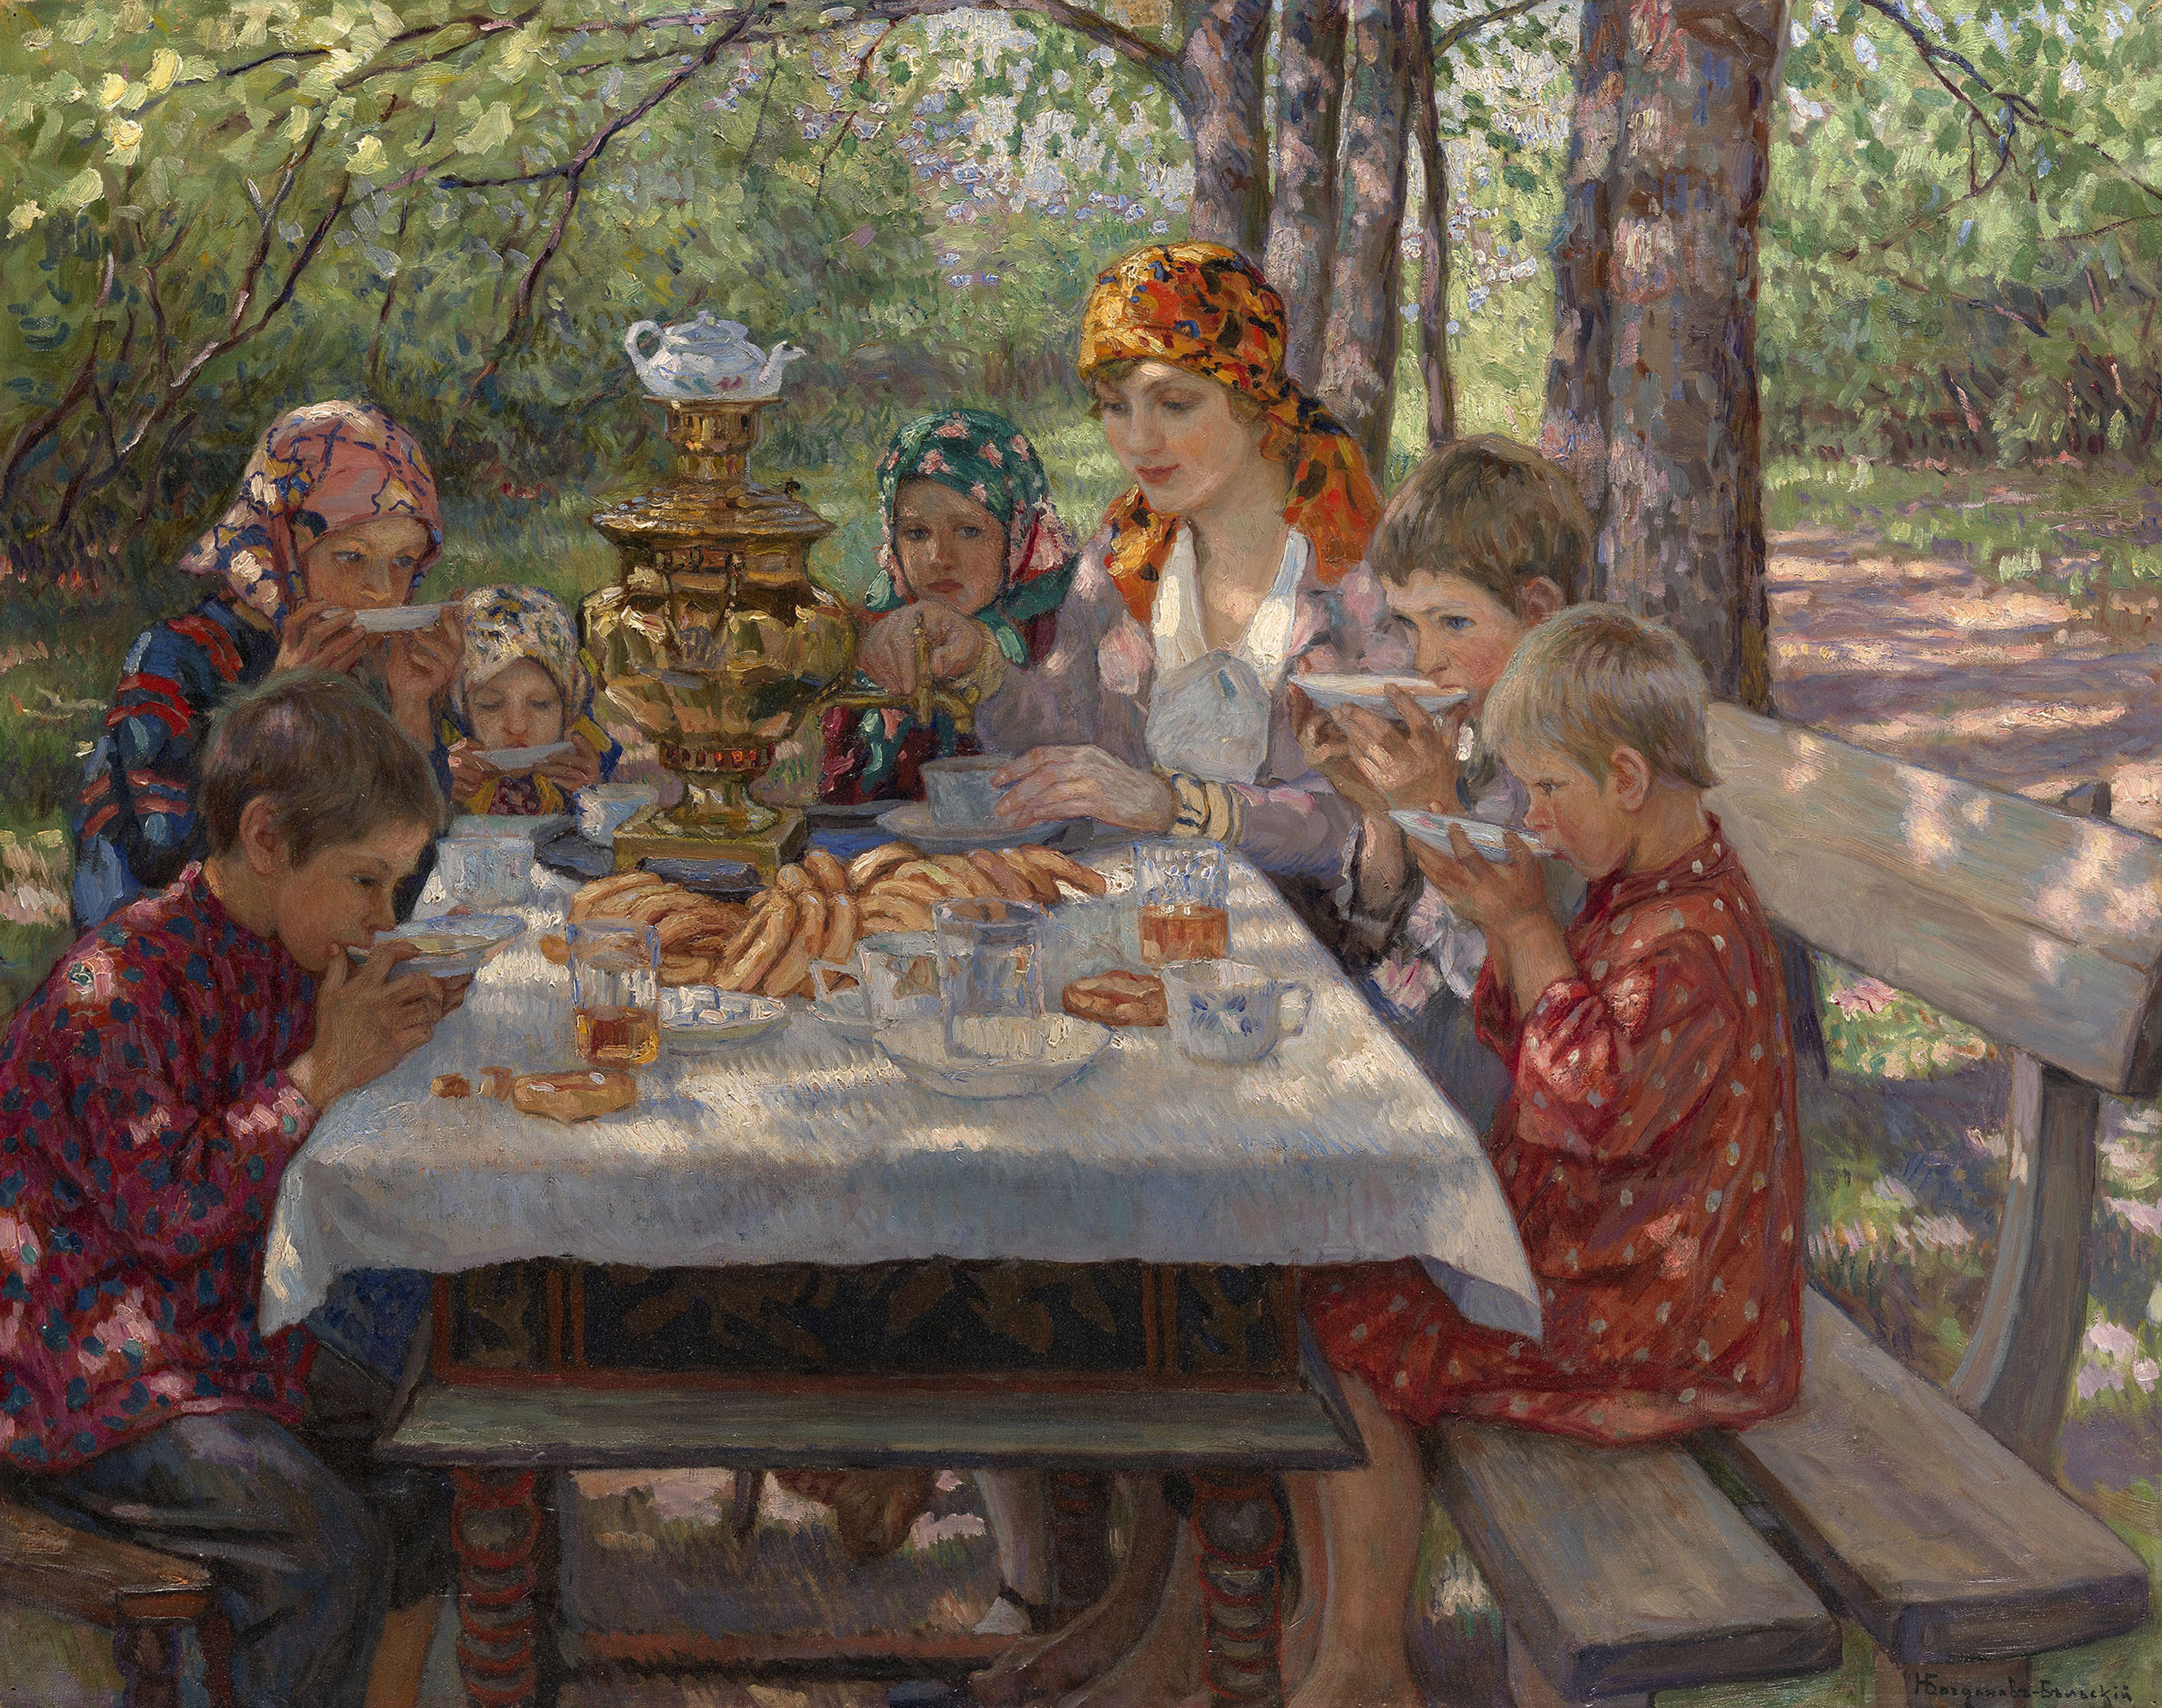 The Teacher's Guests. Artist: Bogdanov-Belsky, Nikolai Petrovich (1868-1945)